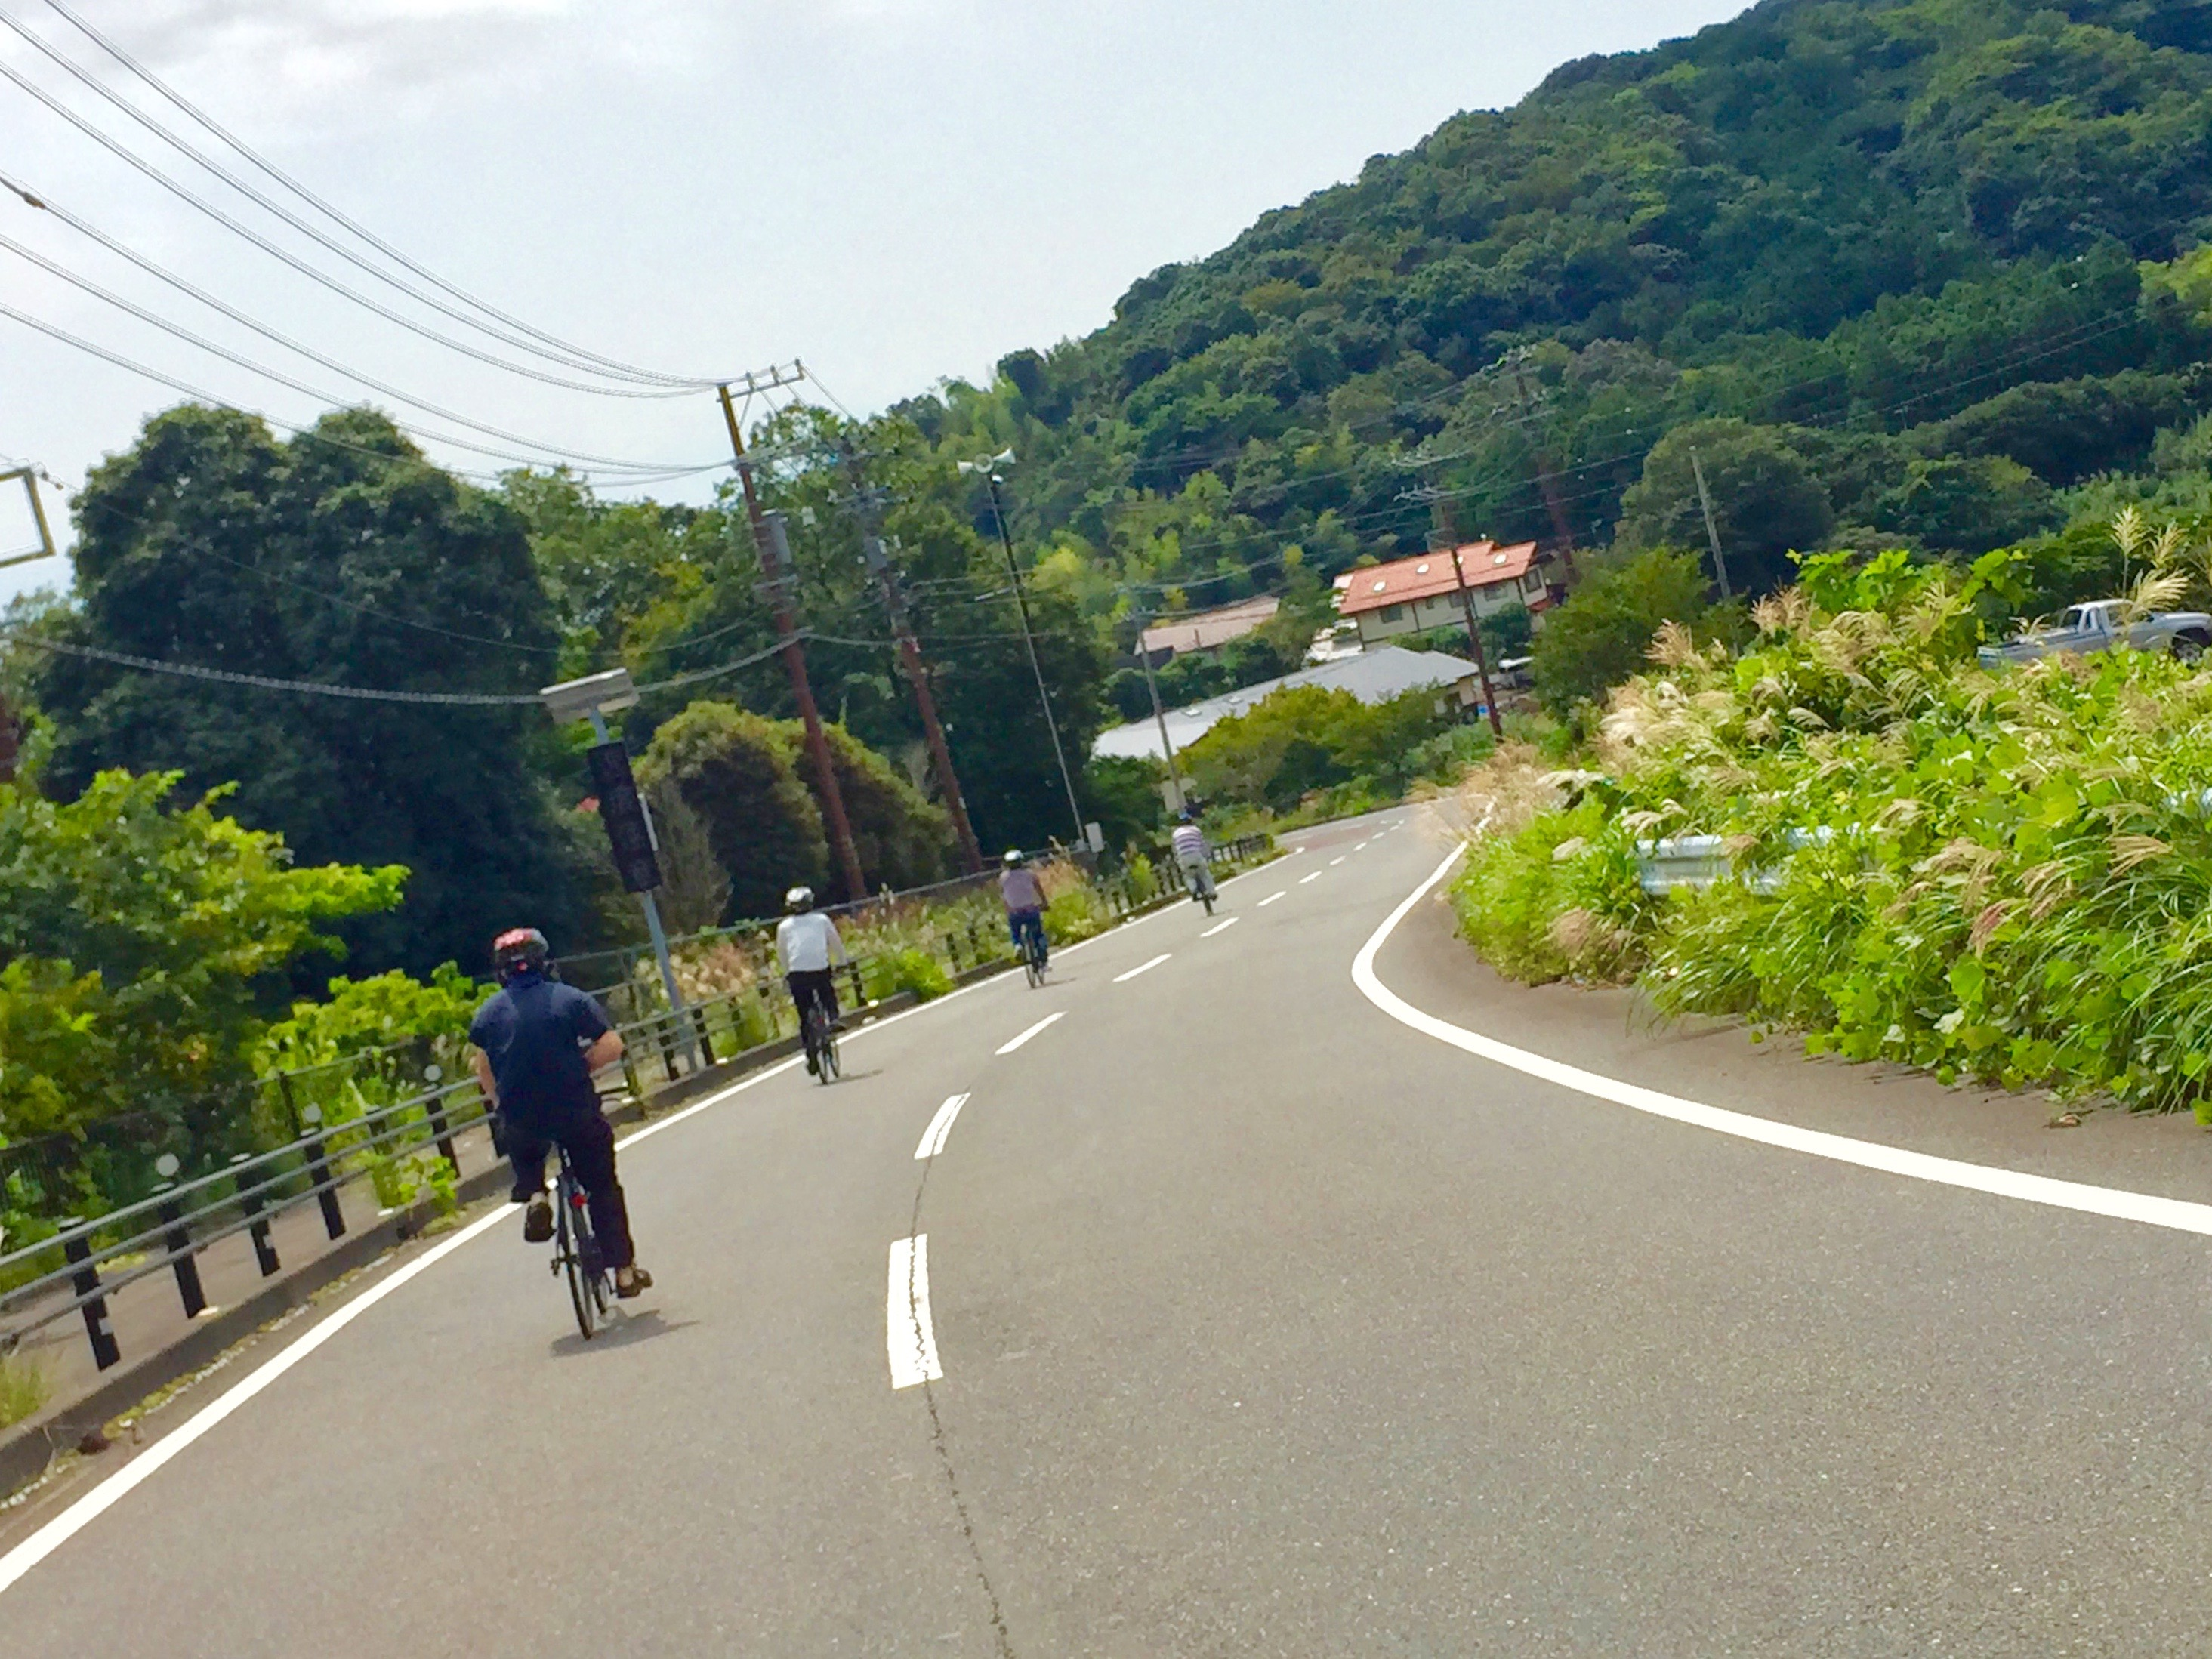 Enjoy comfortable downhill